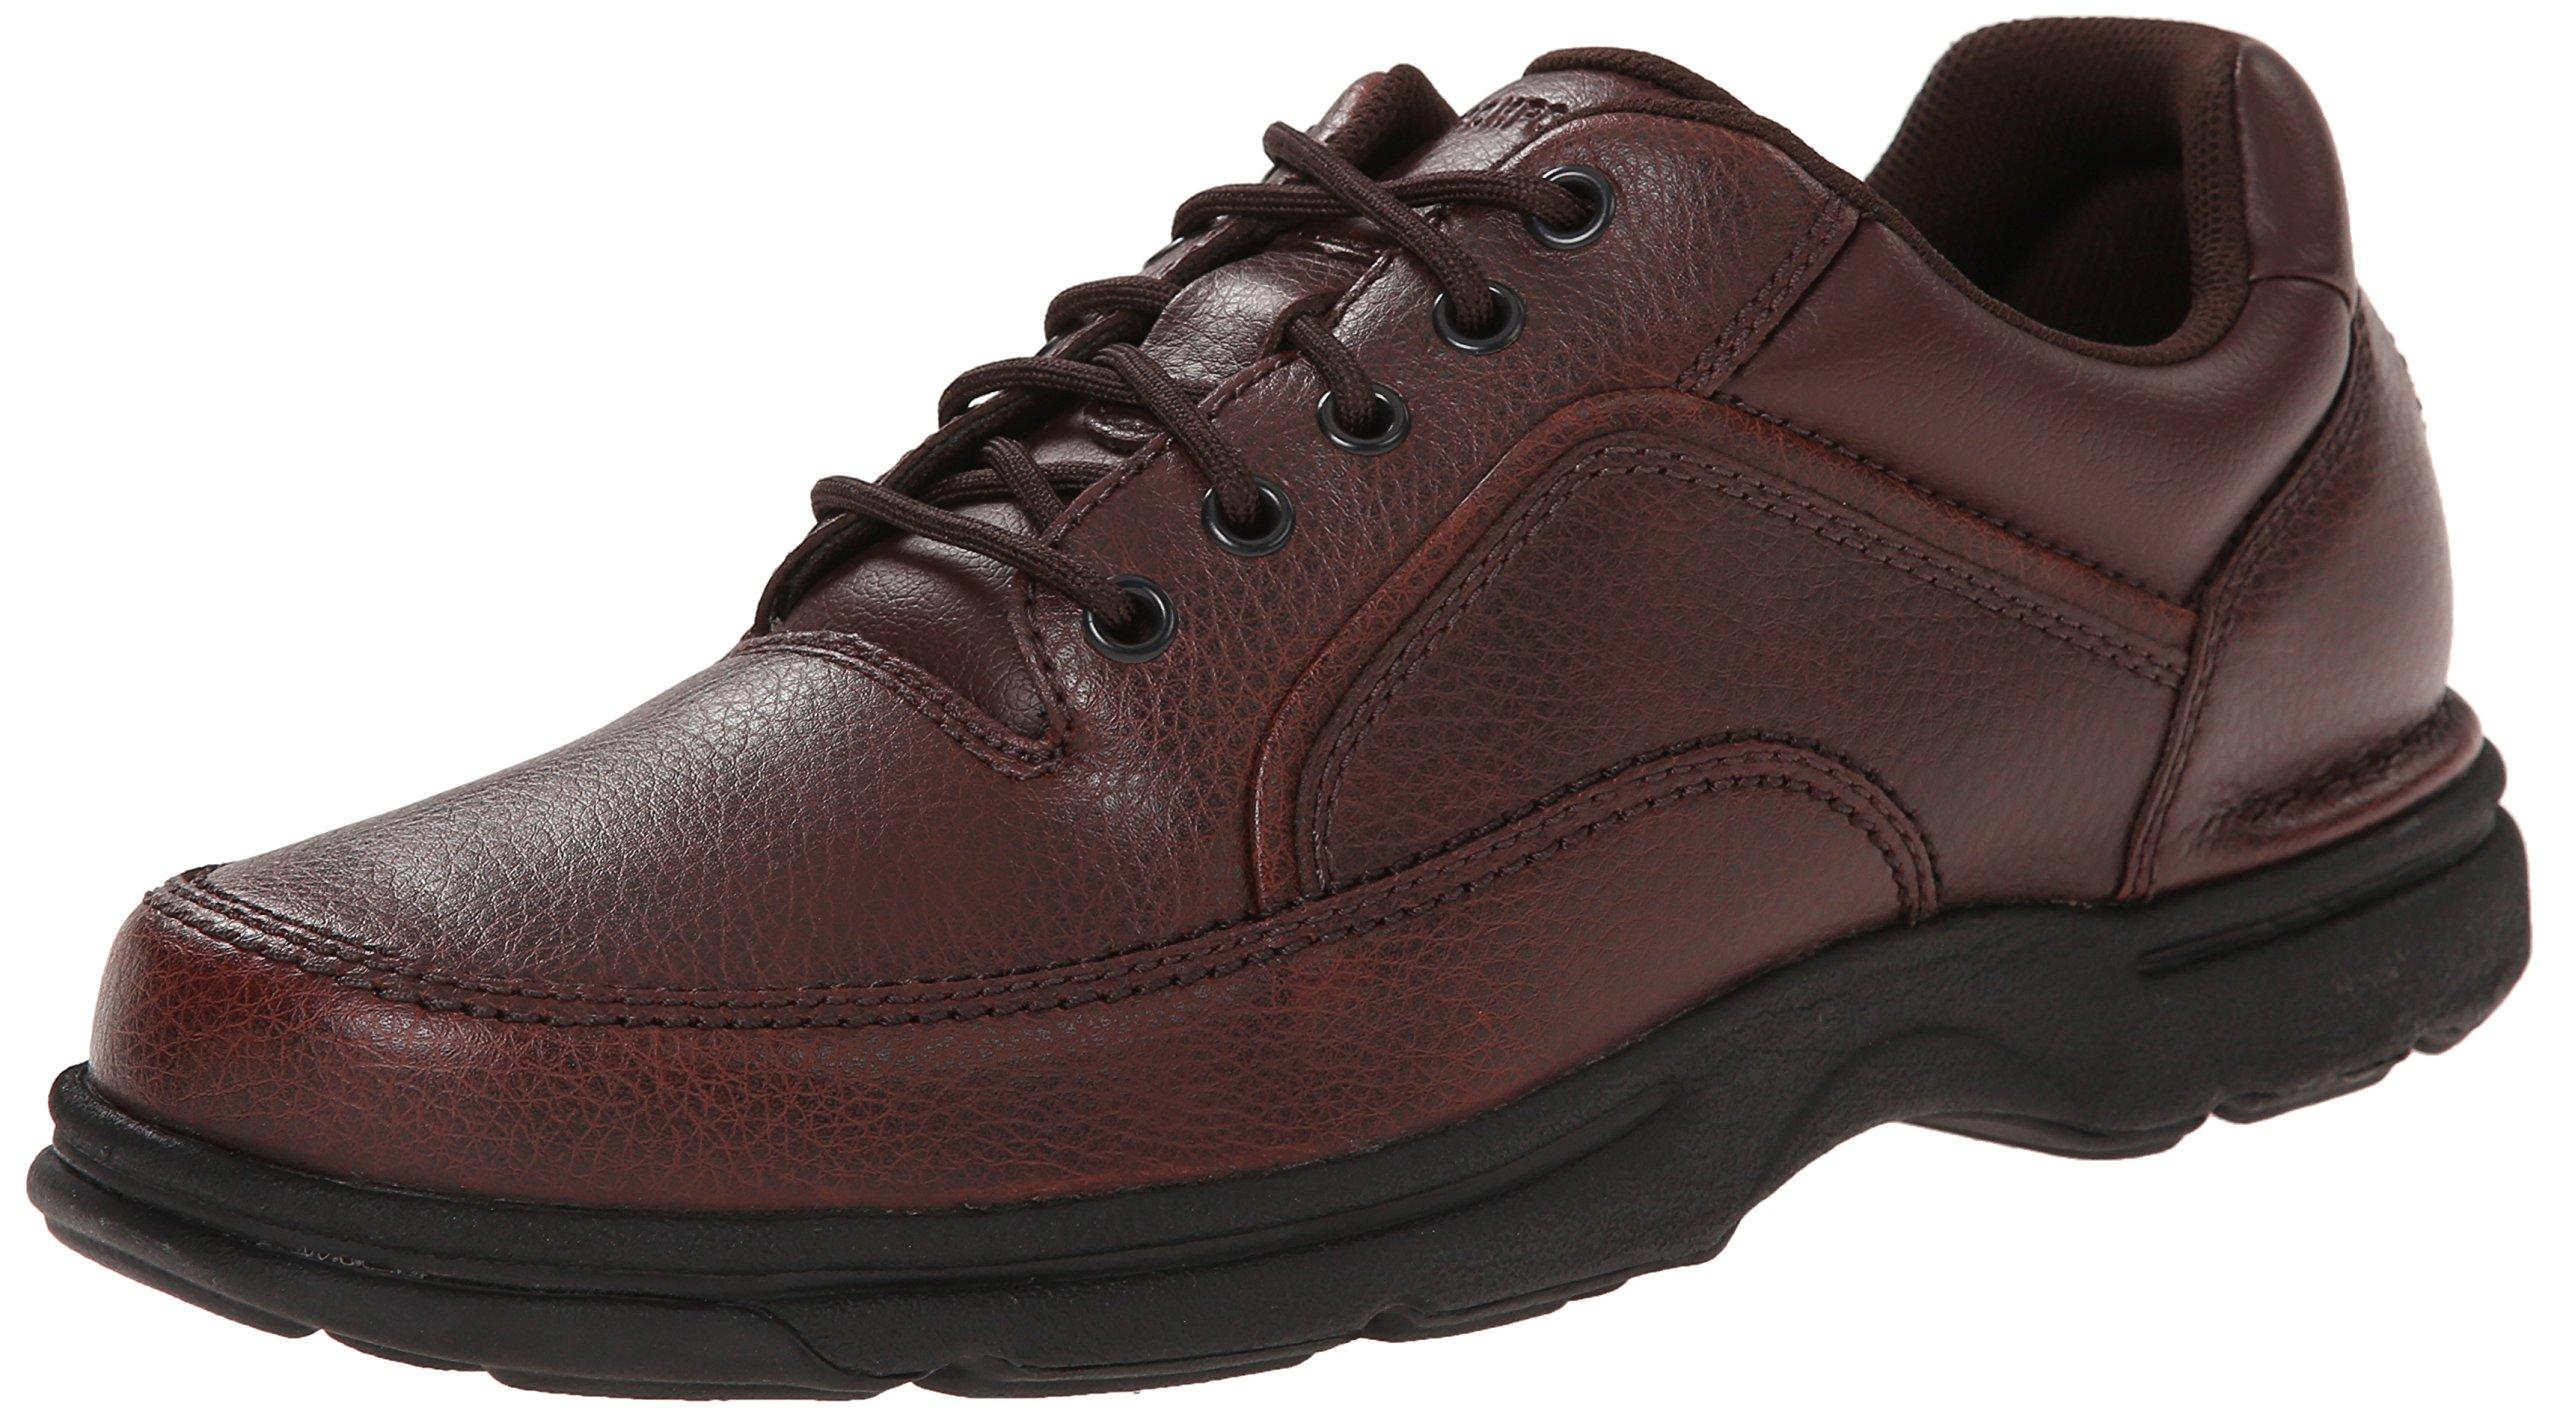 Rockport Men's Eureka Walking Shoe, Brown, 10.5 2E US by Rockport